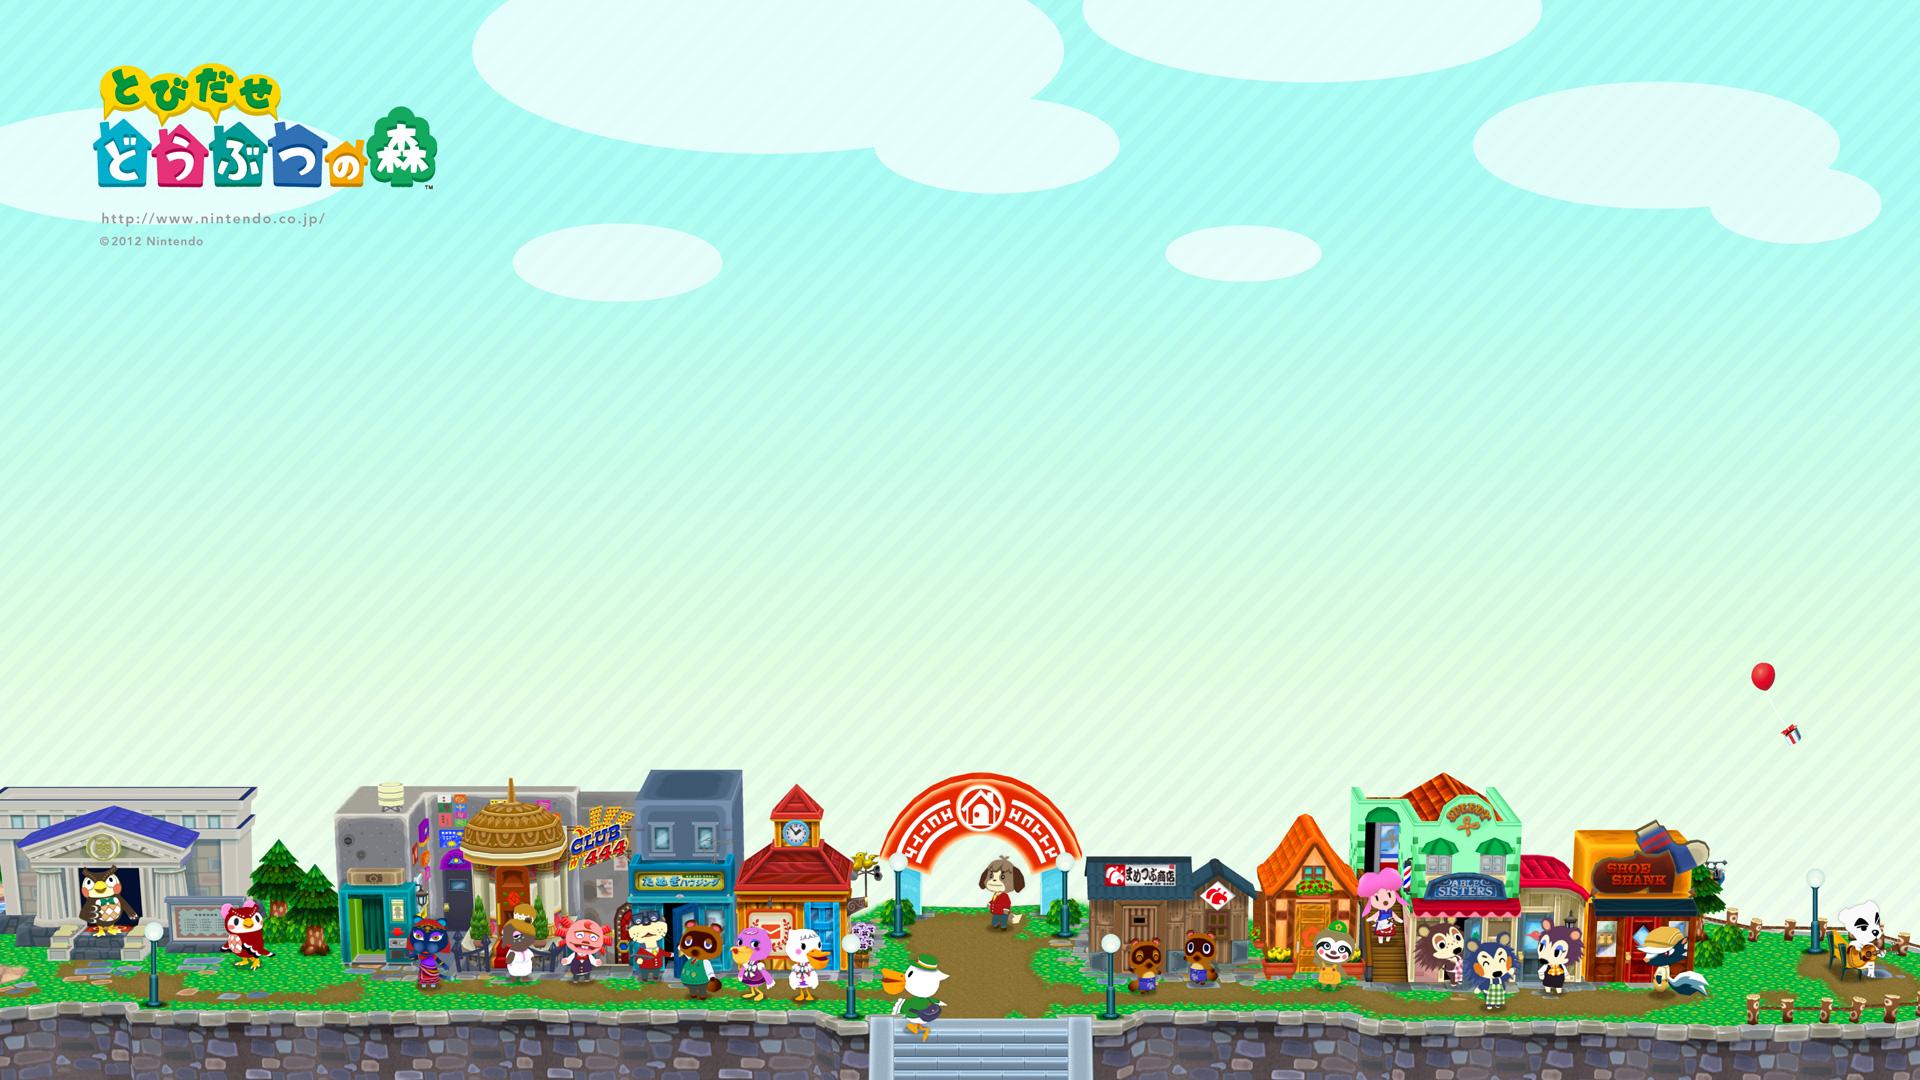 Wallpaper 1920x1080 Px Animal Crossing 1920x1080